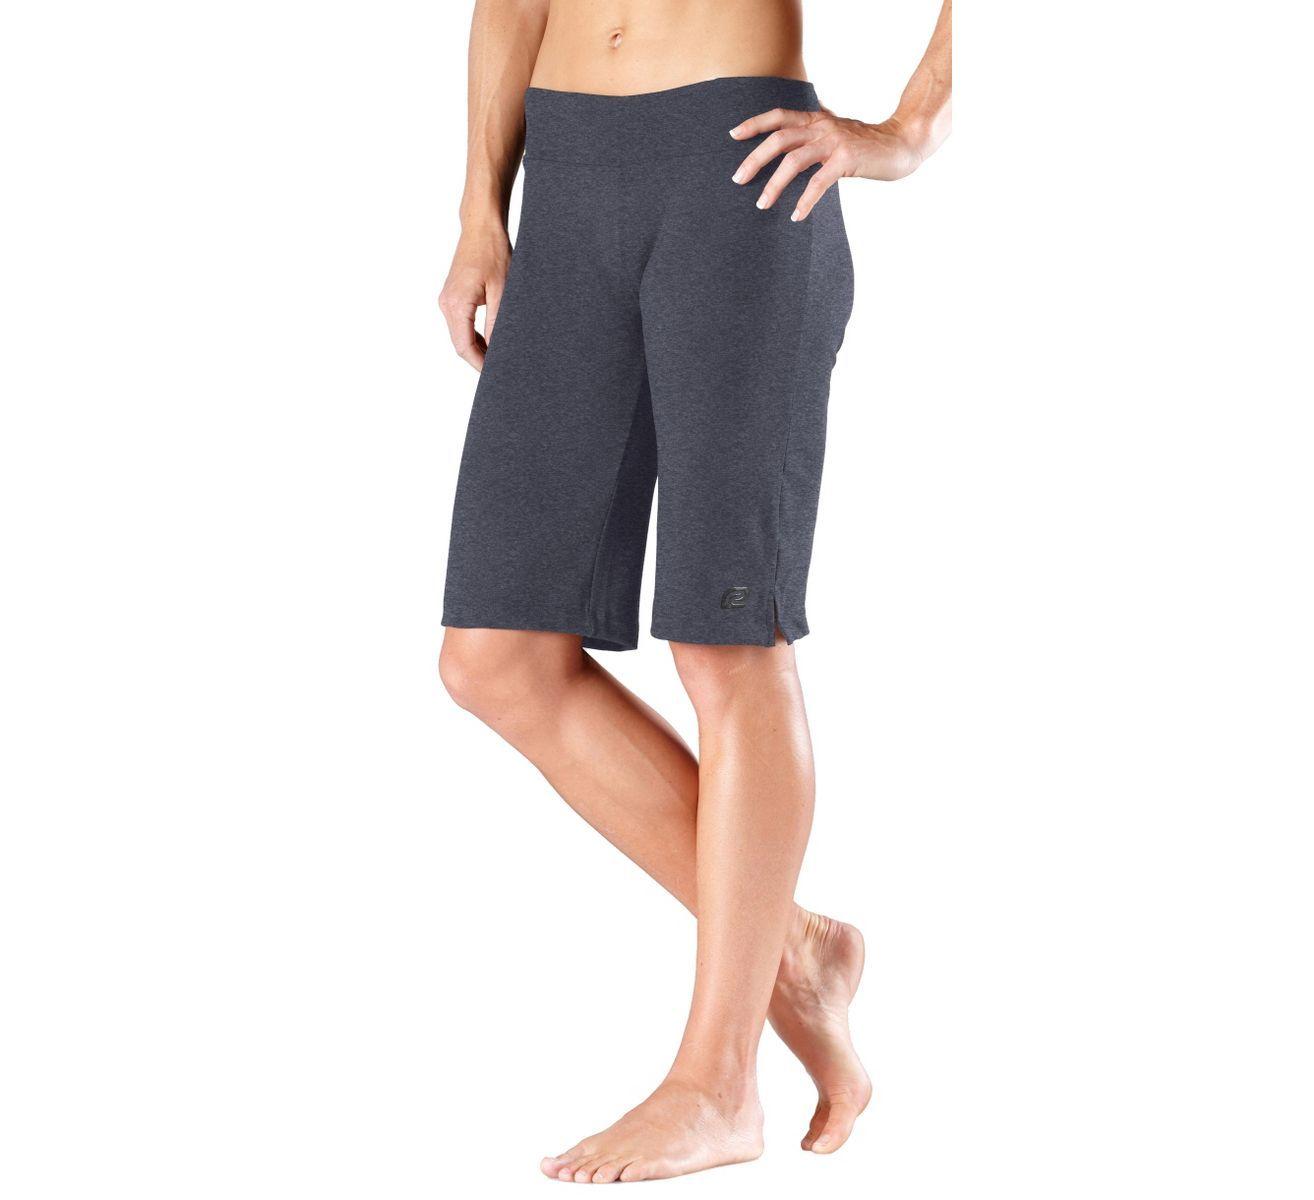 "Women's RGear Run, Walk, Play 12"" Knee Short Shorts"